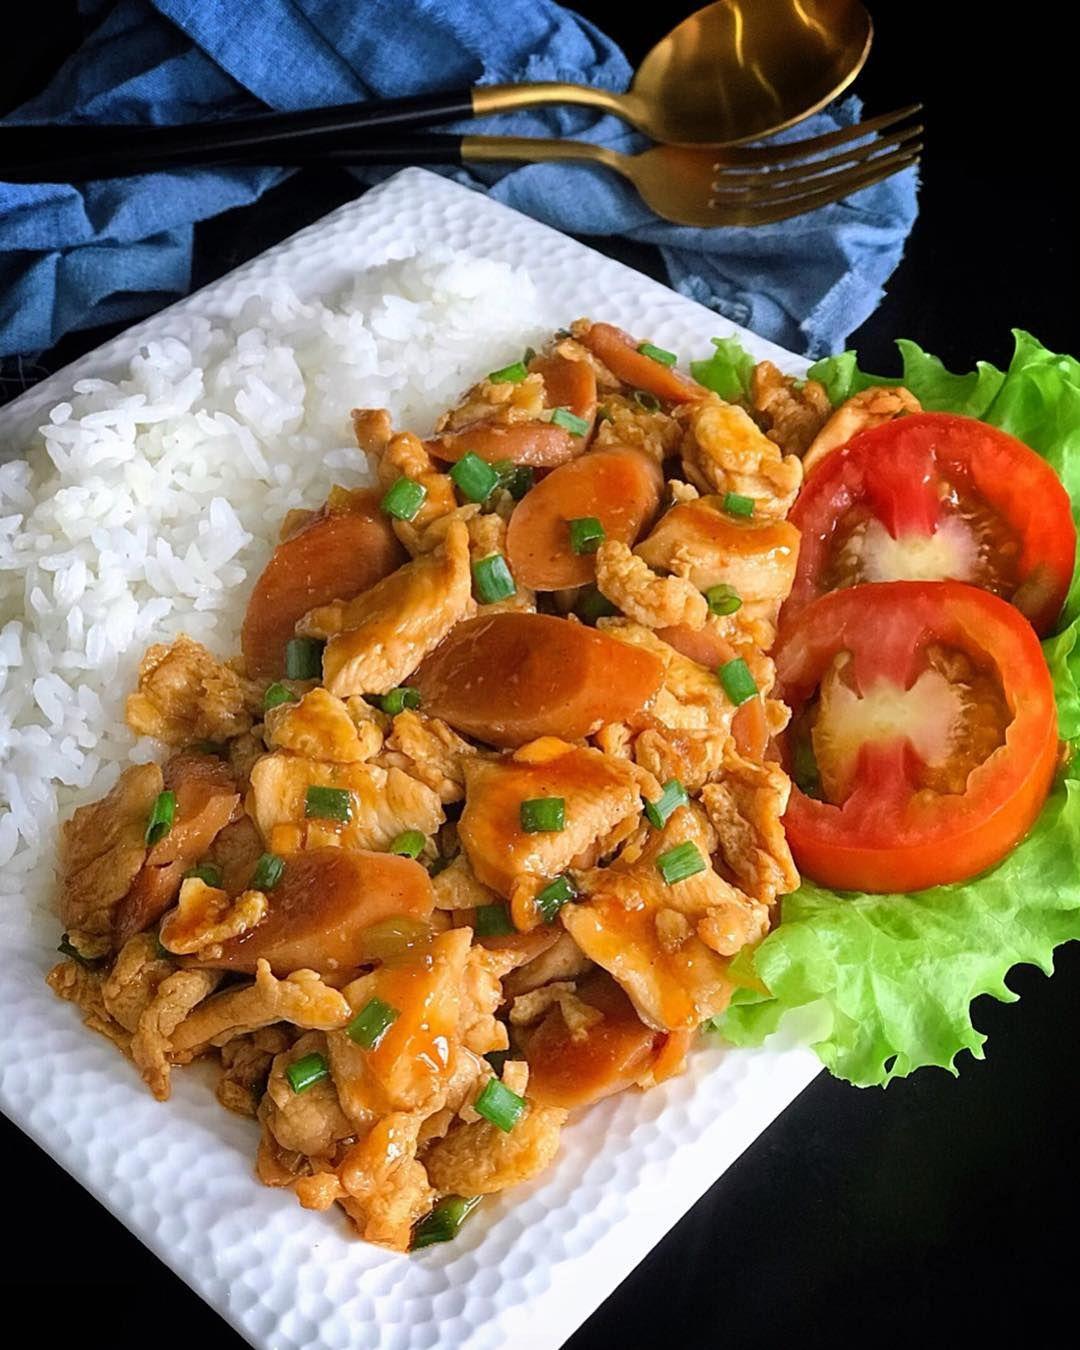 2 546 Likes 50 Comments Lina Gui Linagui Kitchen On Instagram Happy Friday Selamat Pagi Beberapa Hari Lalu Say Di 2020 Resep Masakan Masakan Simpel Masakan